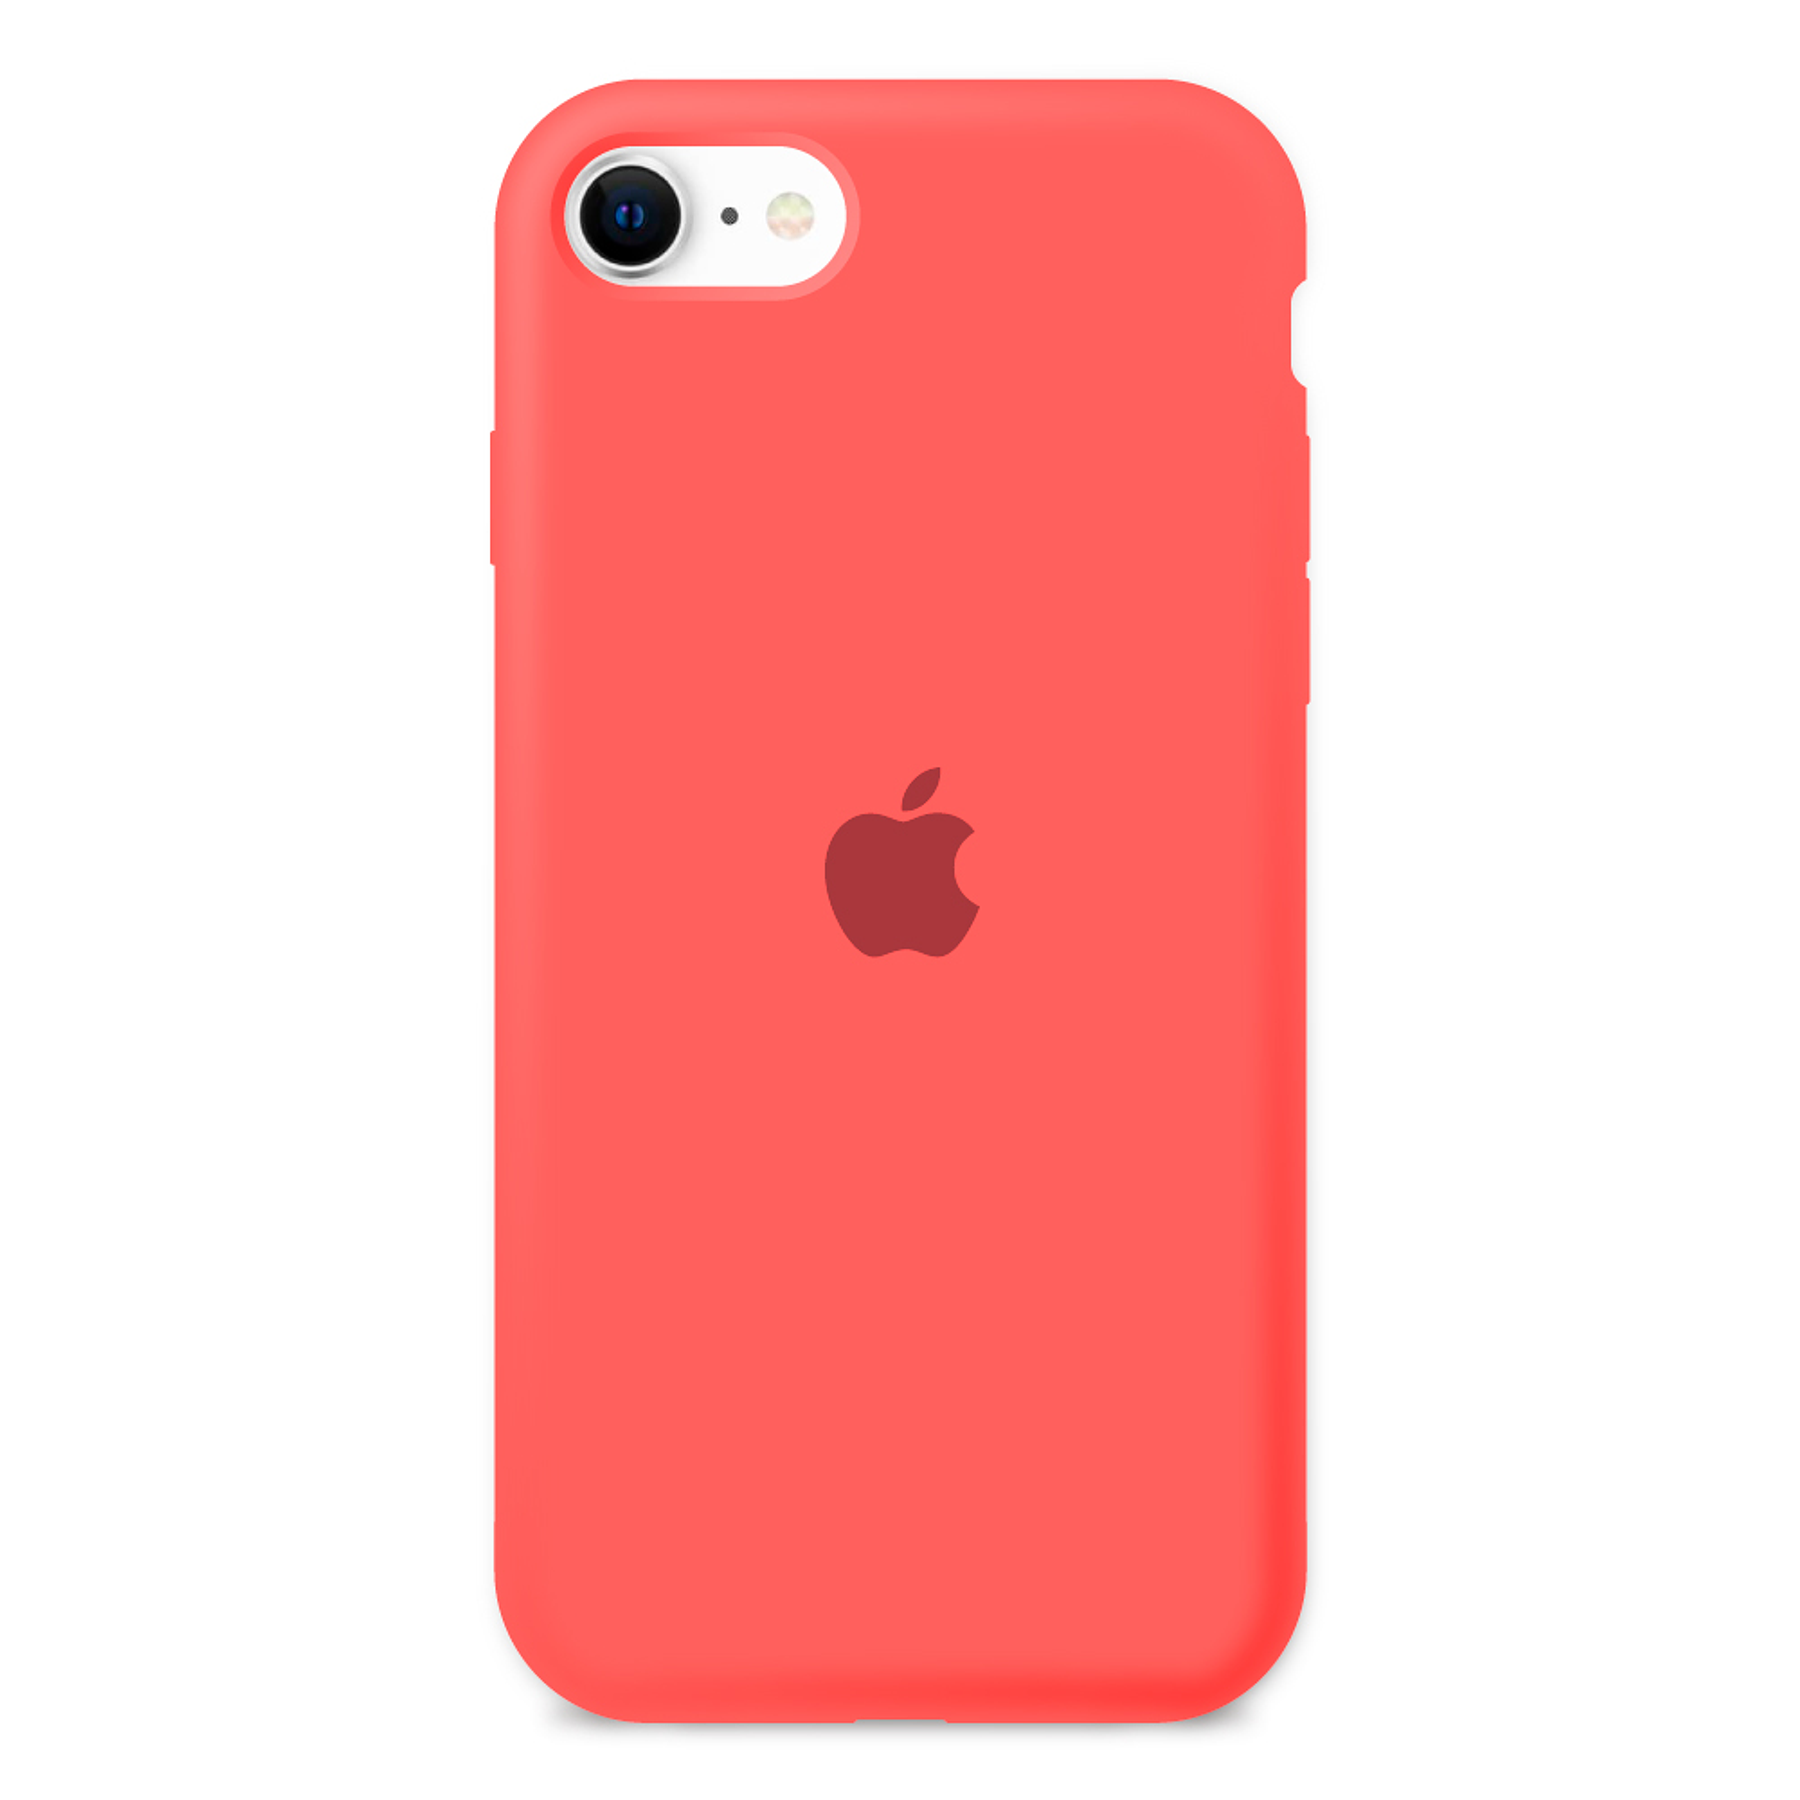 iPhone 7 - 8 - SE 2020 - Carcasas